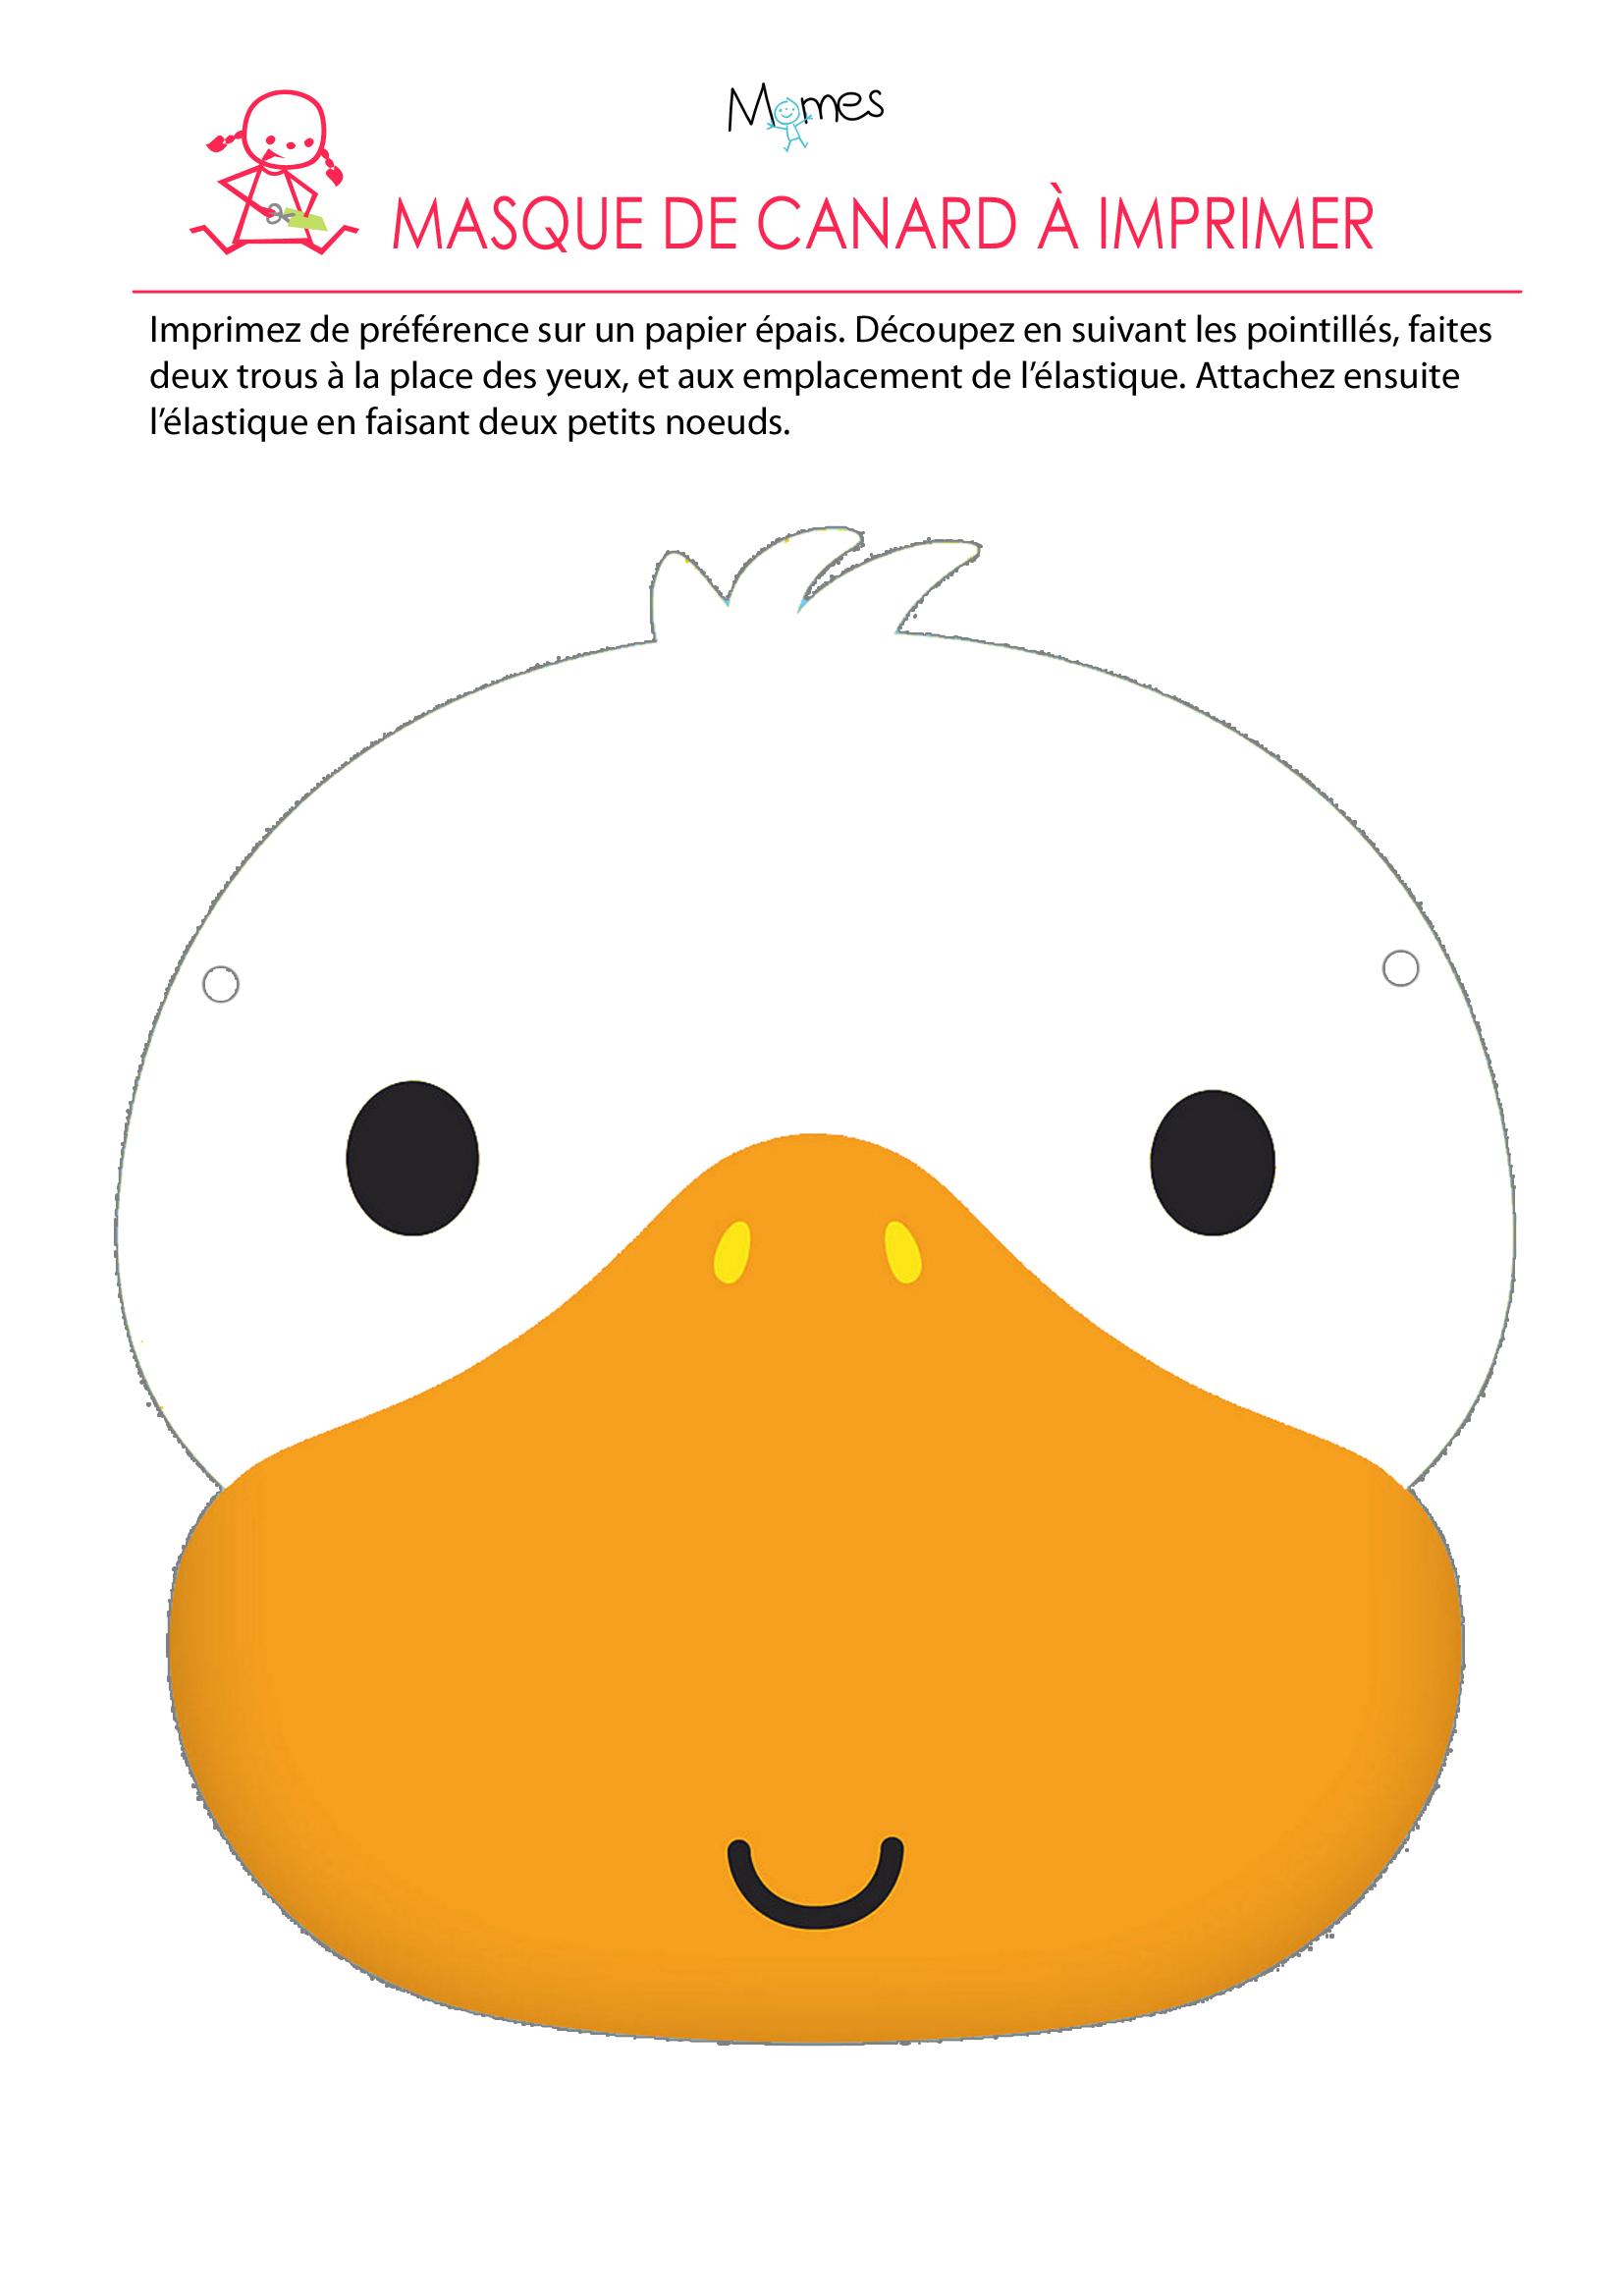 Les masques du carnaval le masque de canard - Masque canard a imprimer ...